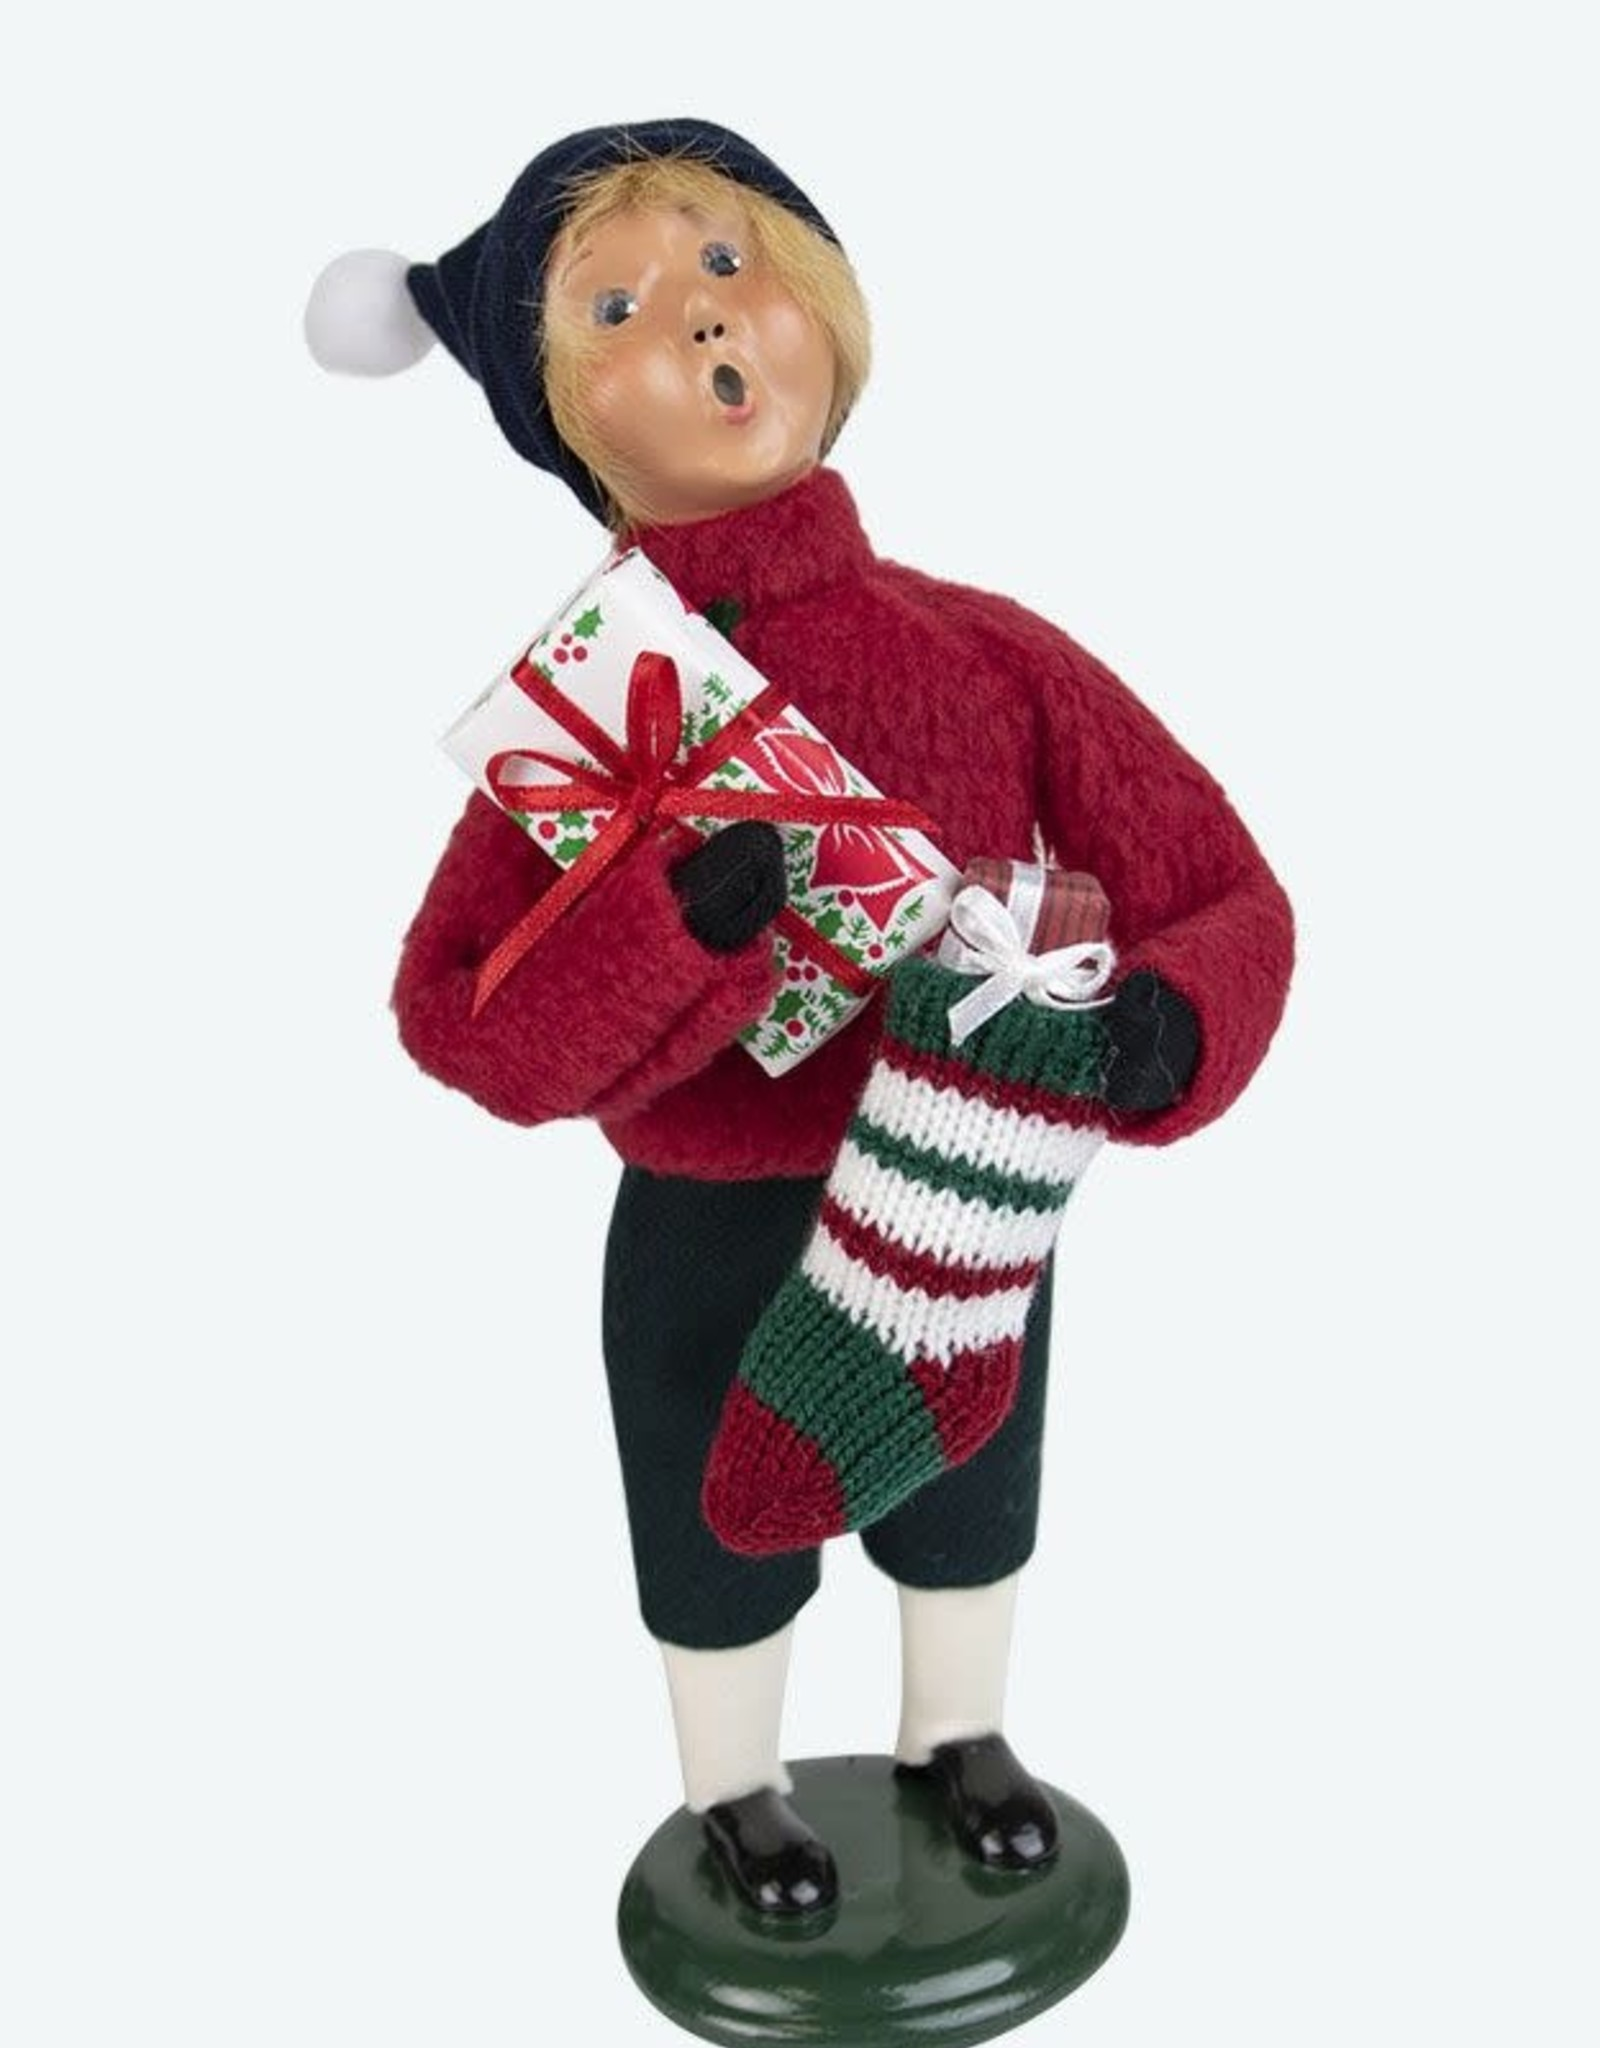 Man w/stocking